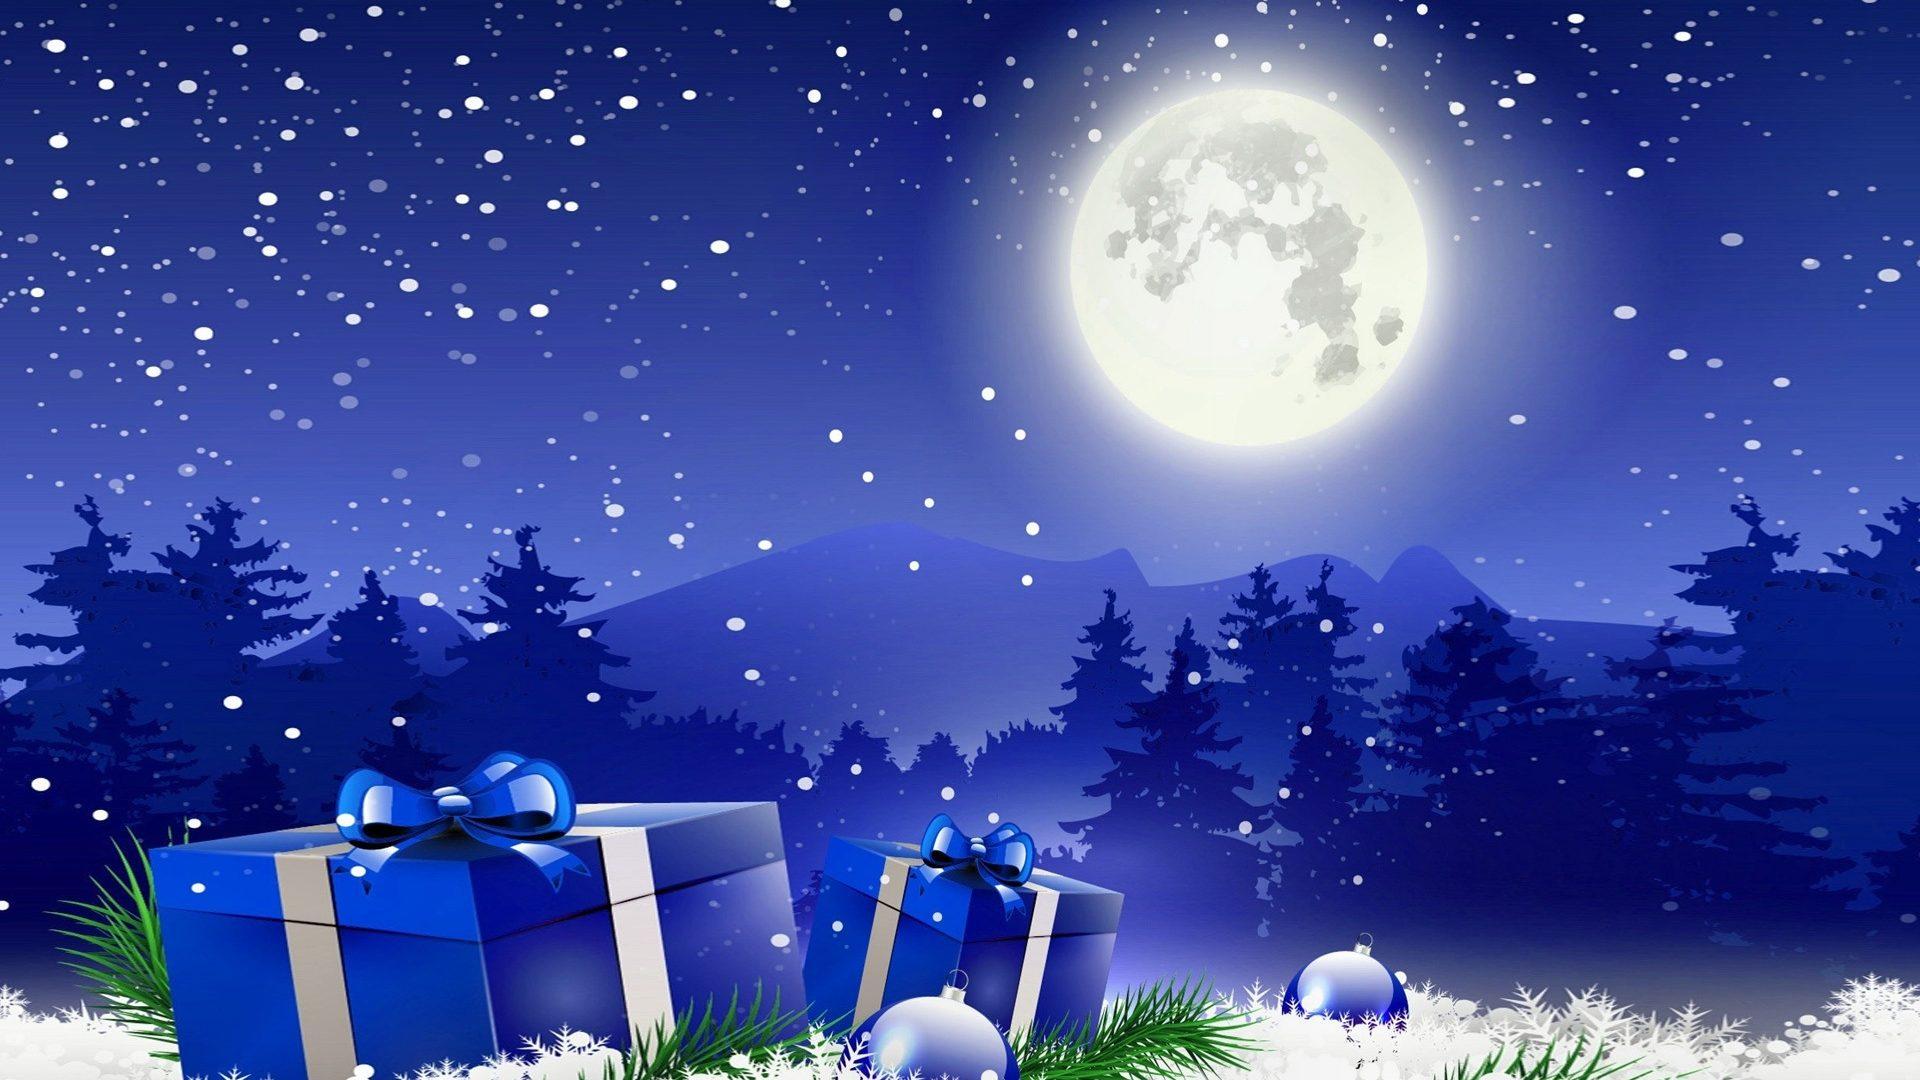 Christmas Winter Moon Gifts Wallpaper For Desktop